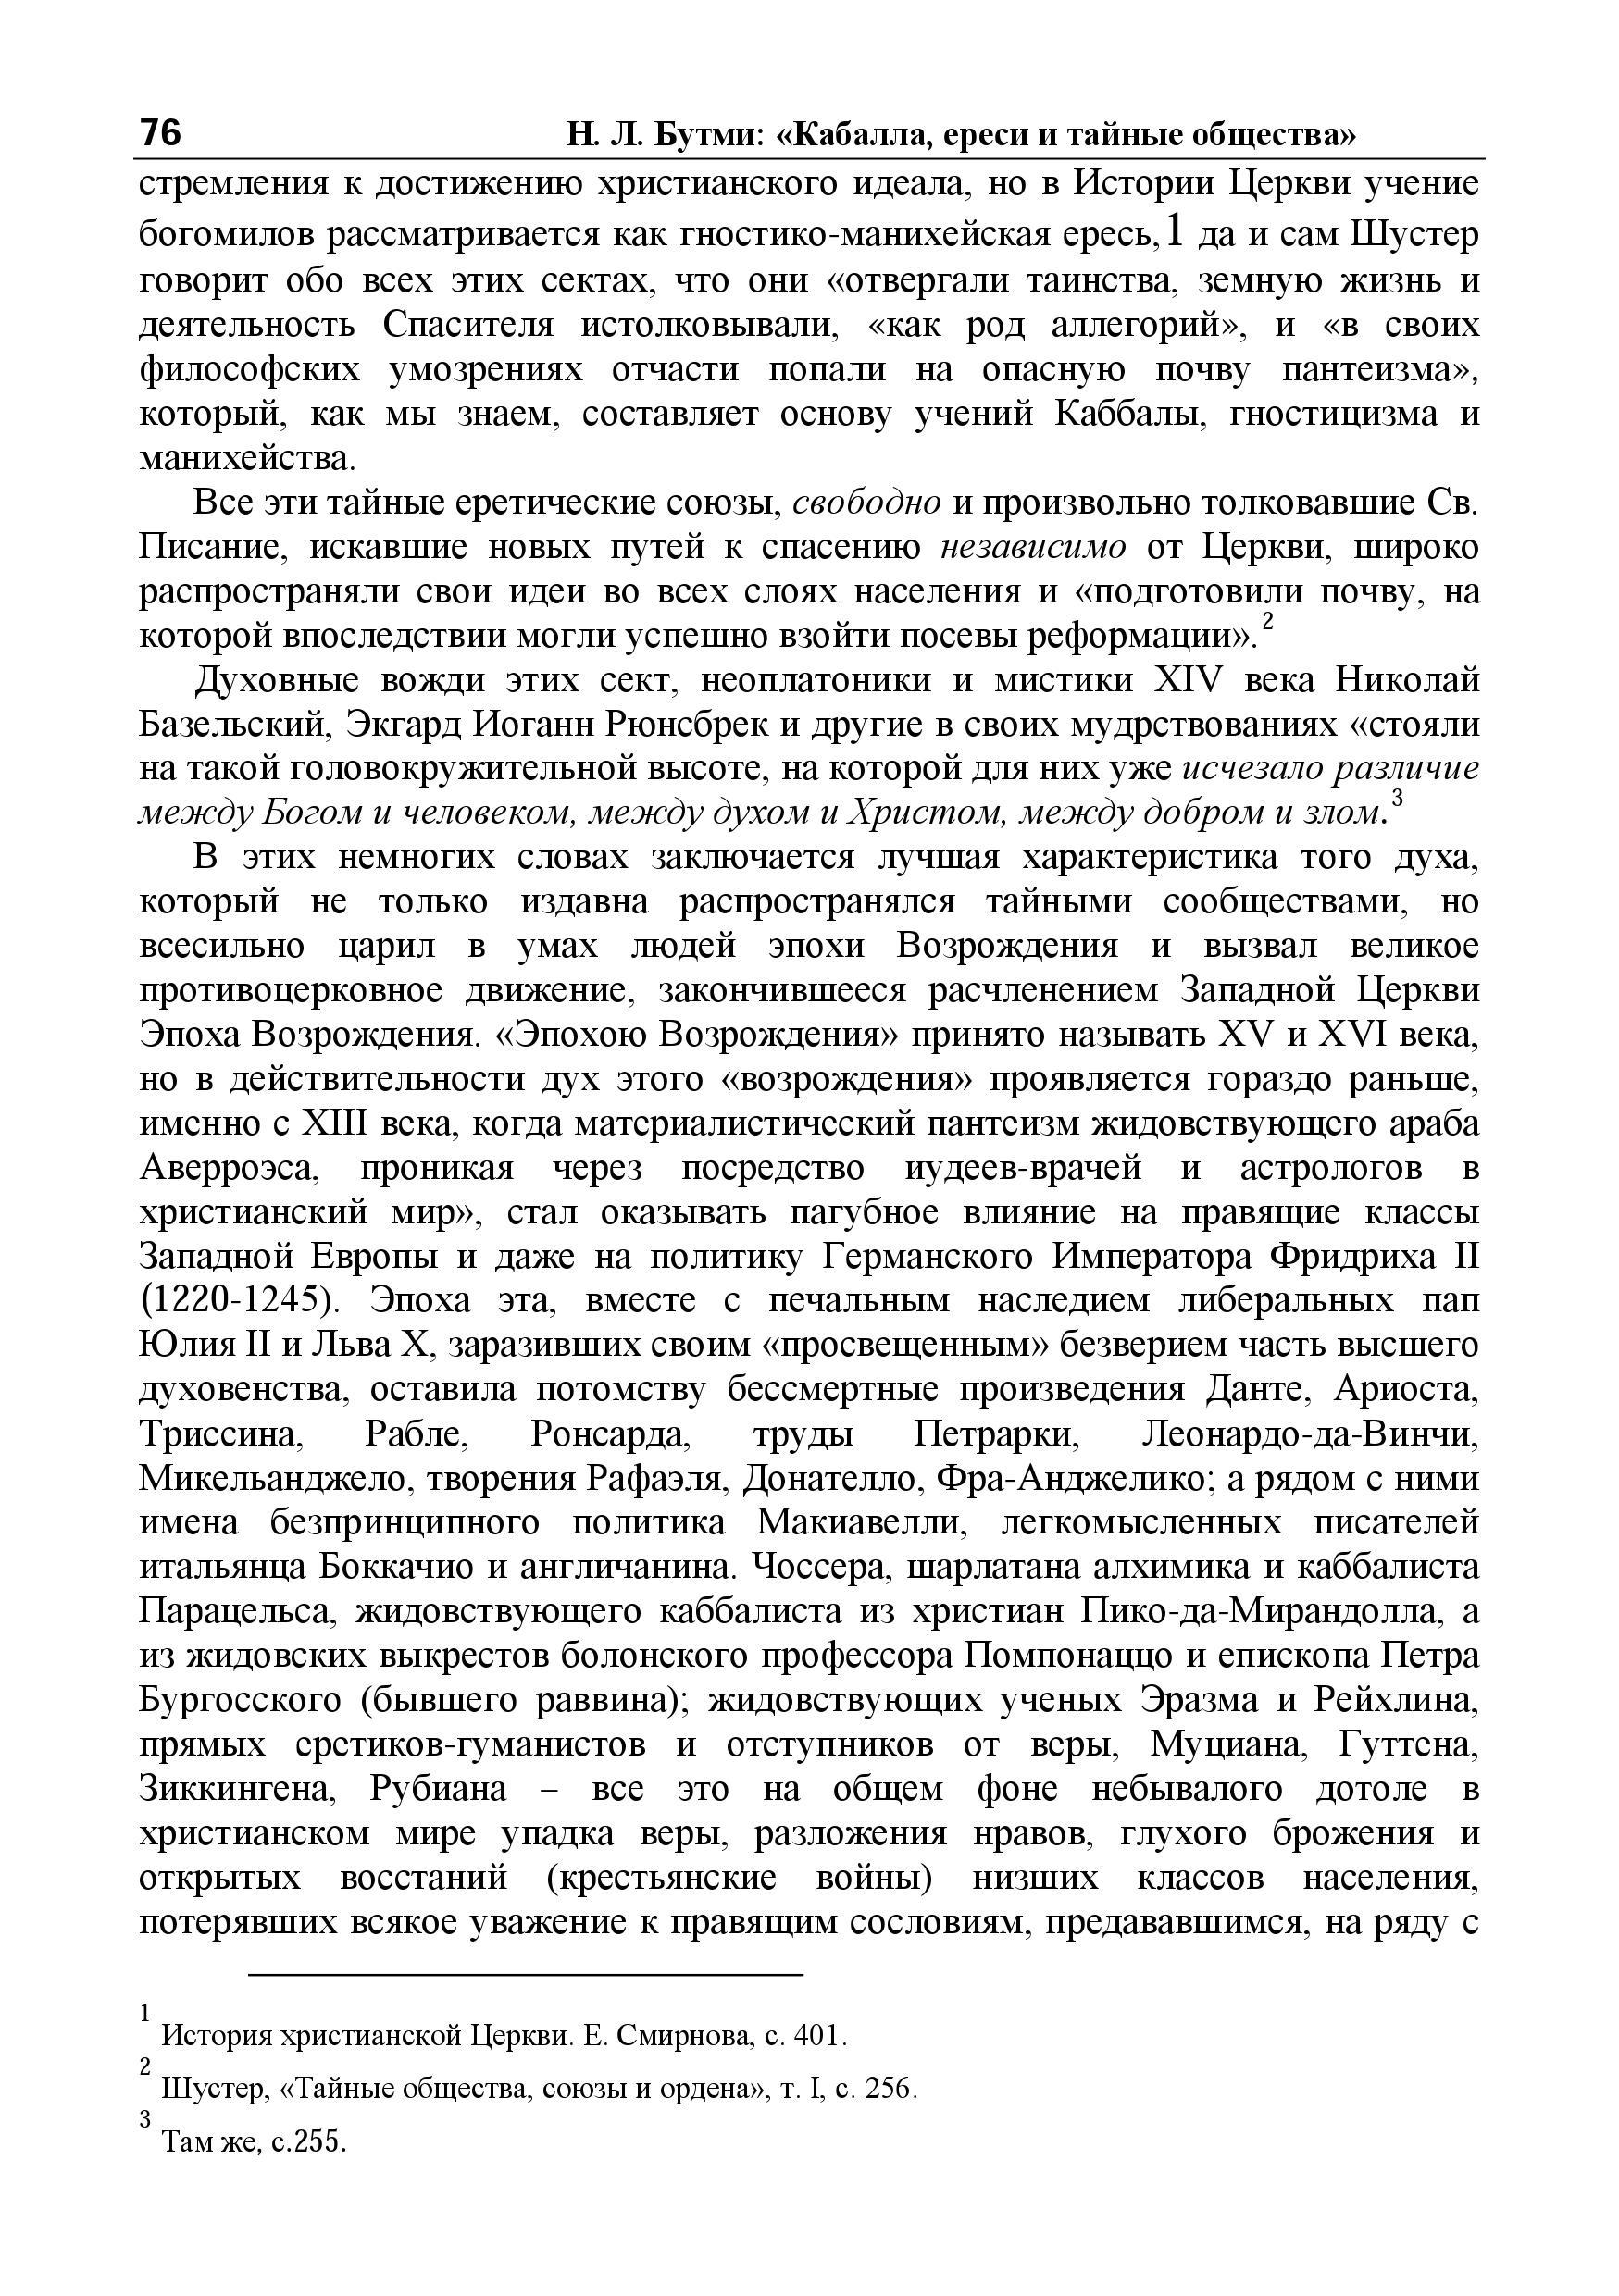 http://sf.uploads.ru/jnWDu.jpg